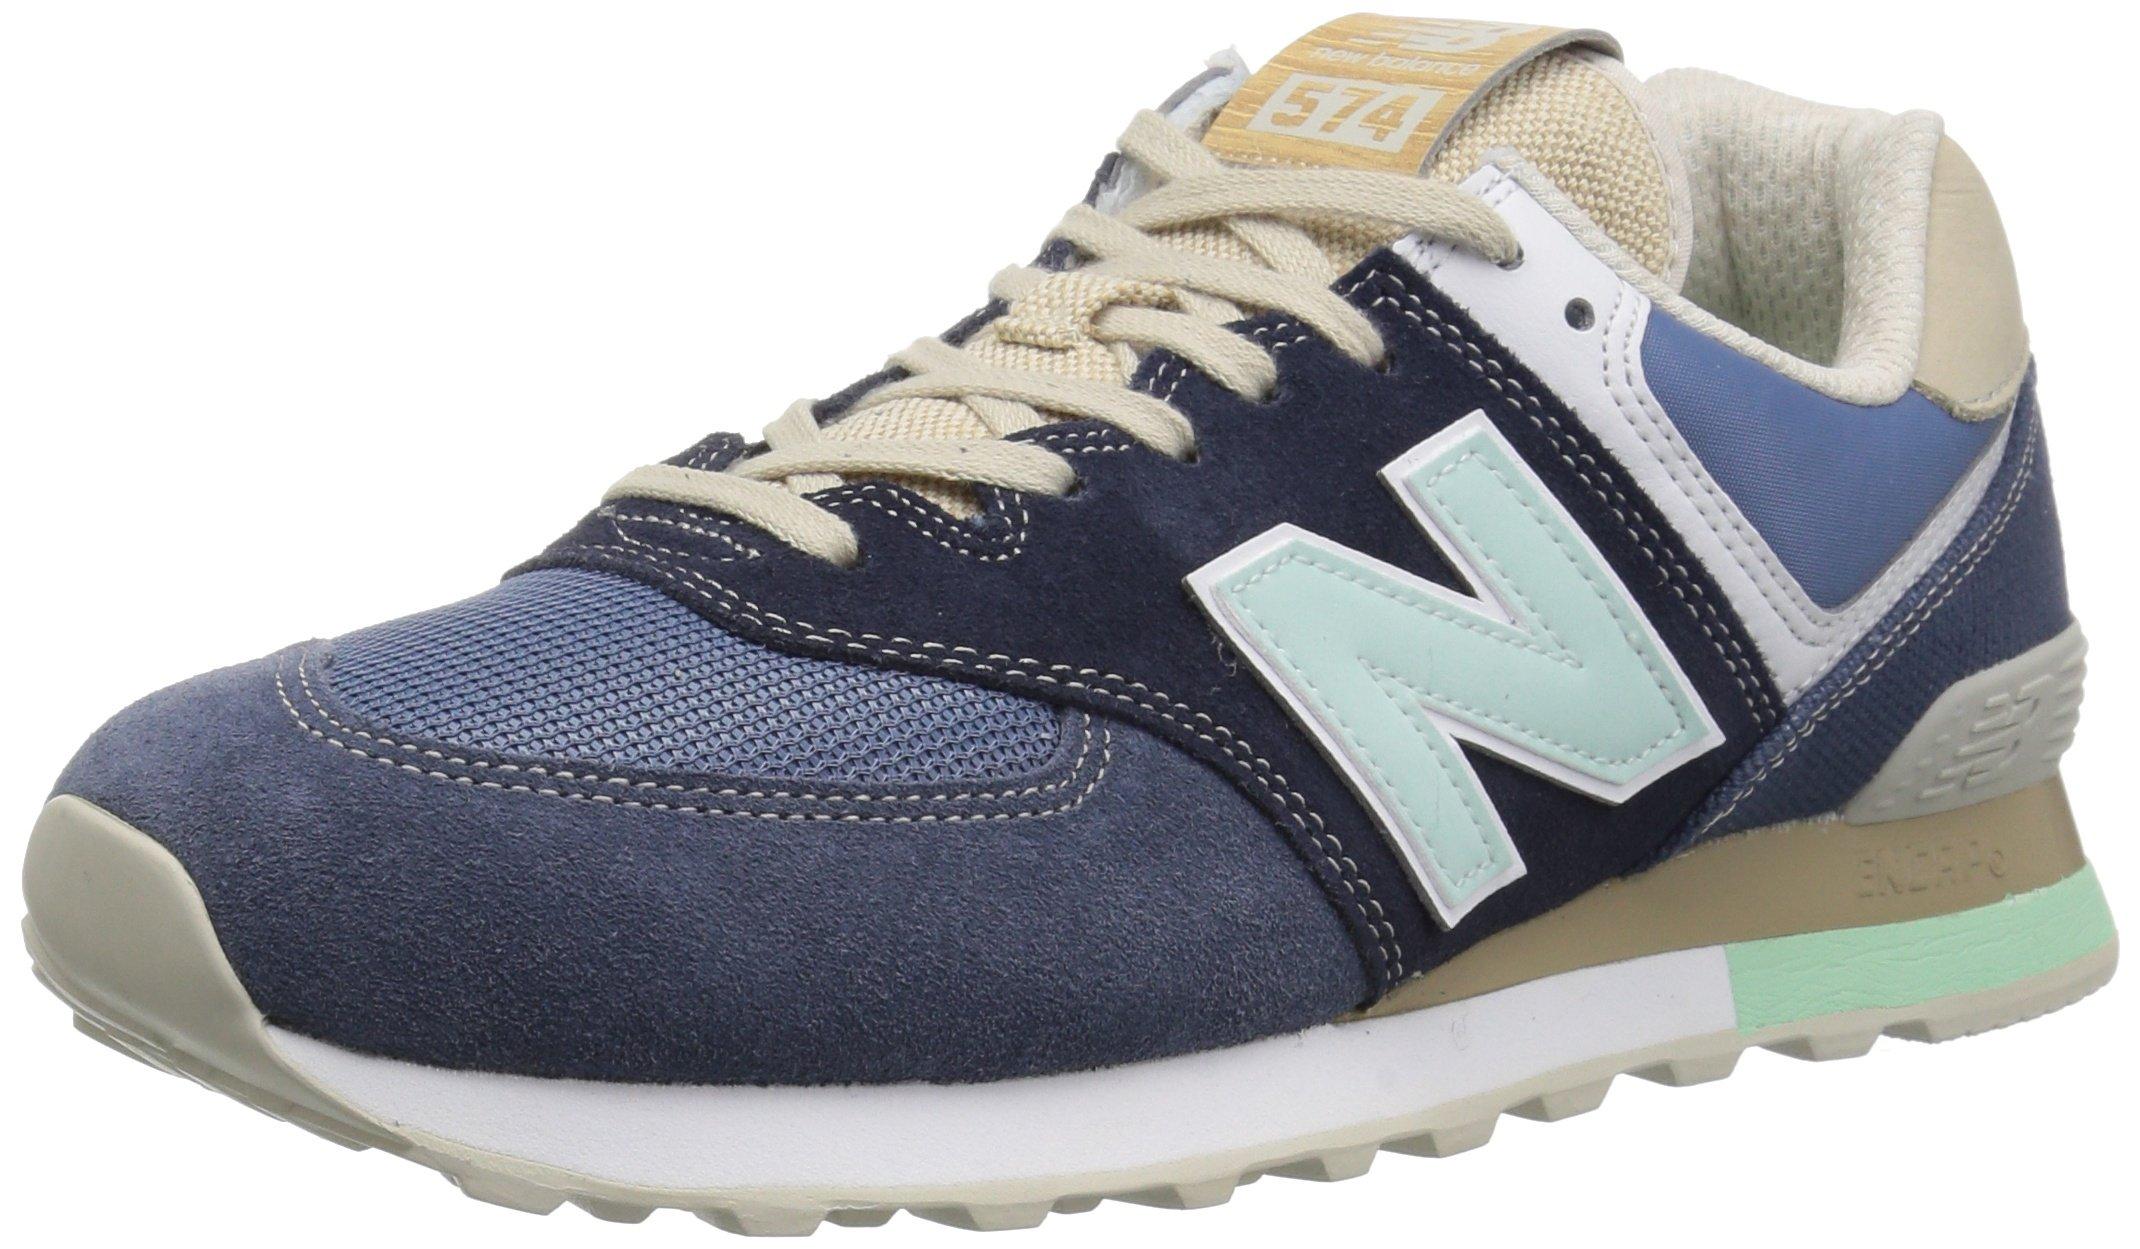 New Balance Men's 574S Sport Sneaker,navy/vintage indigo,7.5 D US